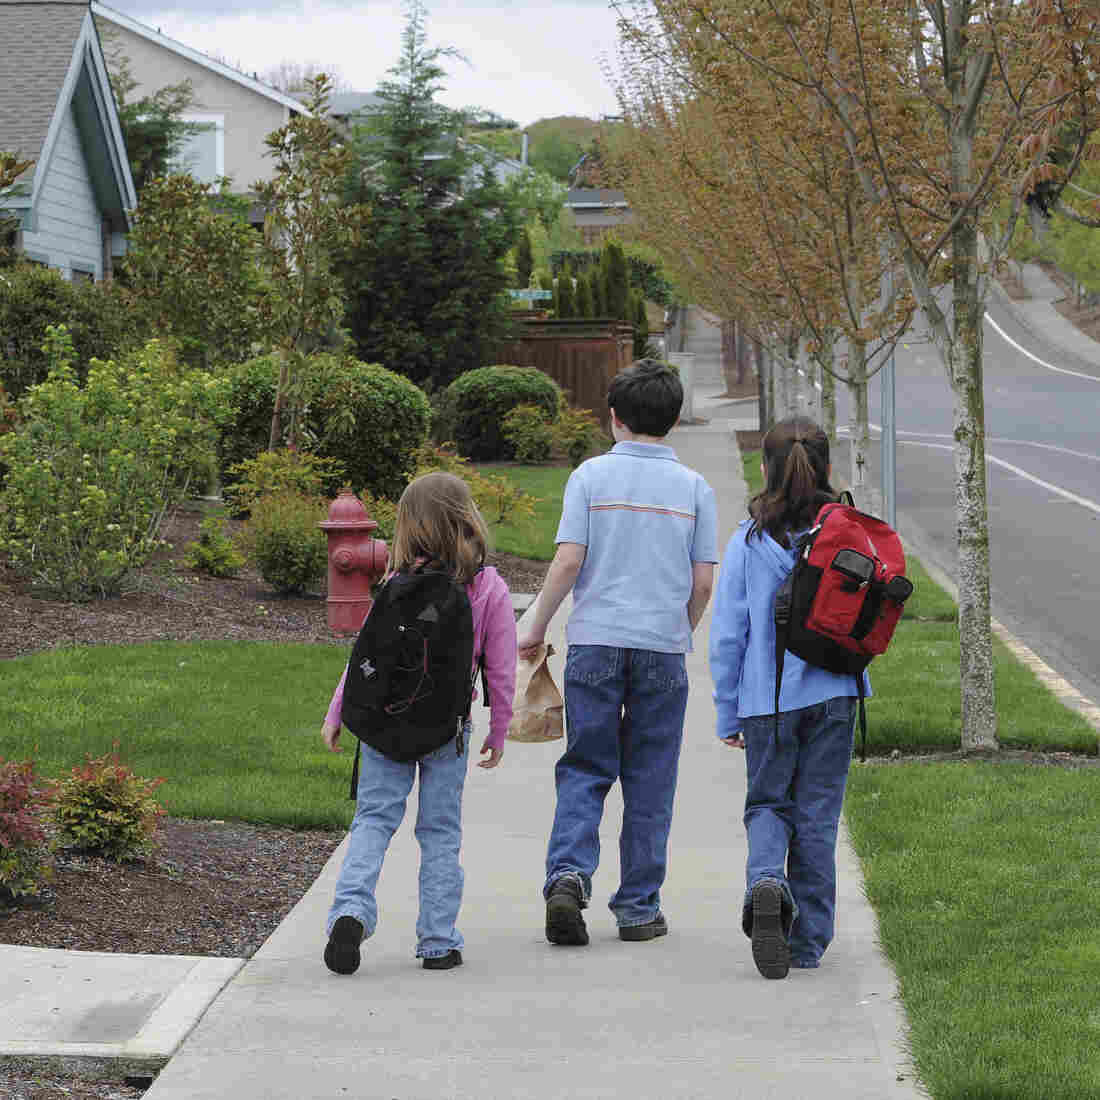 Kids' Solo Playtime Unleashes 'Free-Range' Parenting Debate